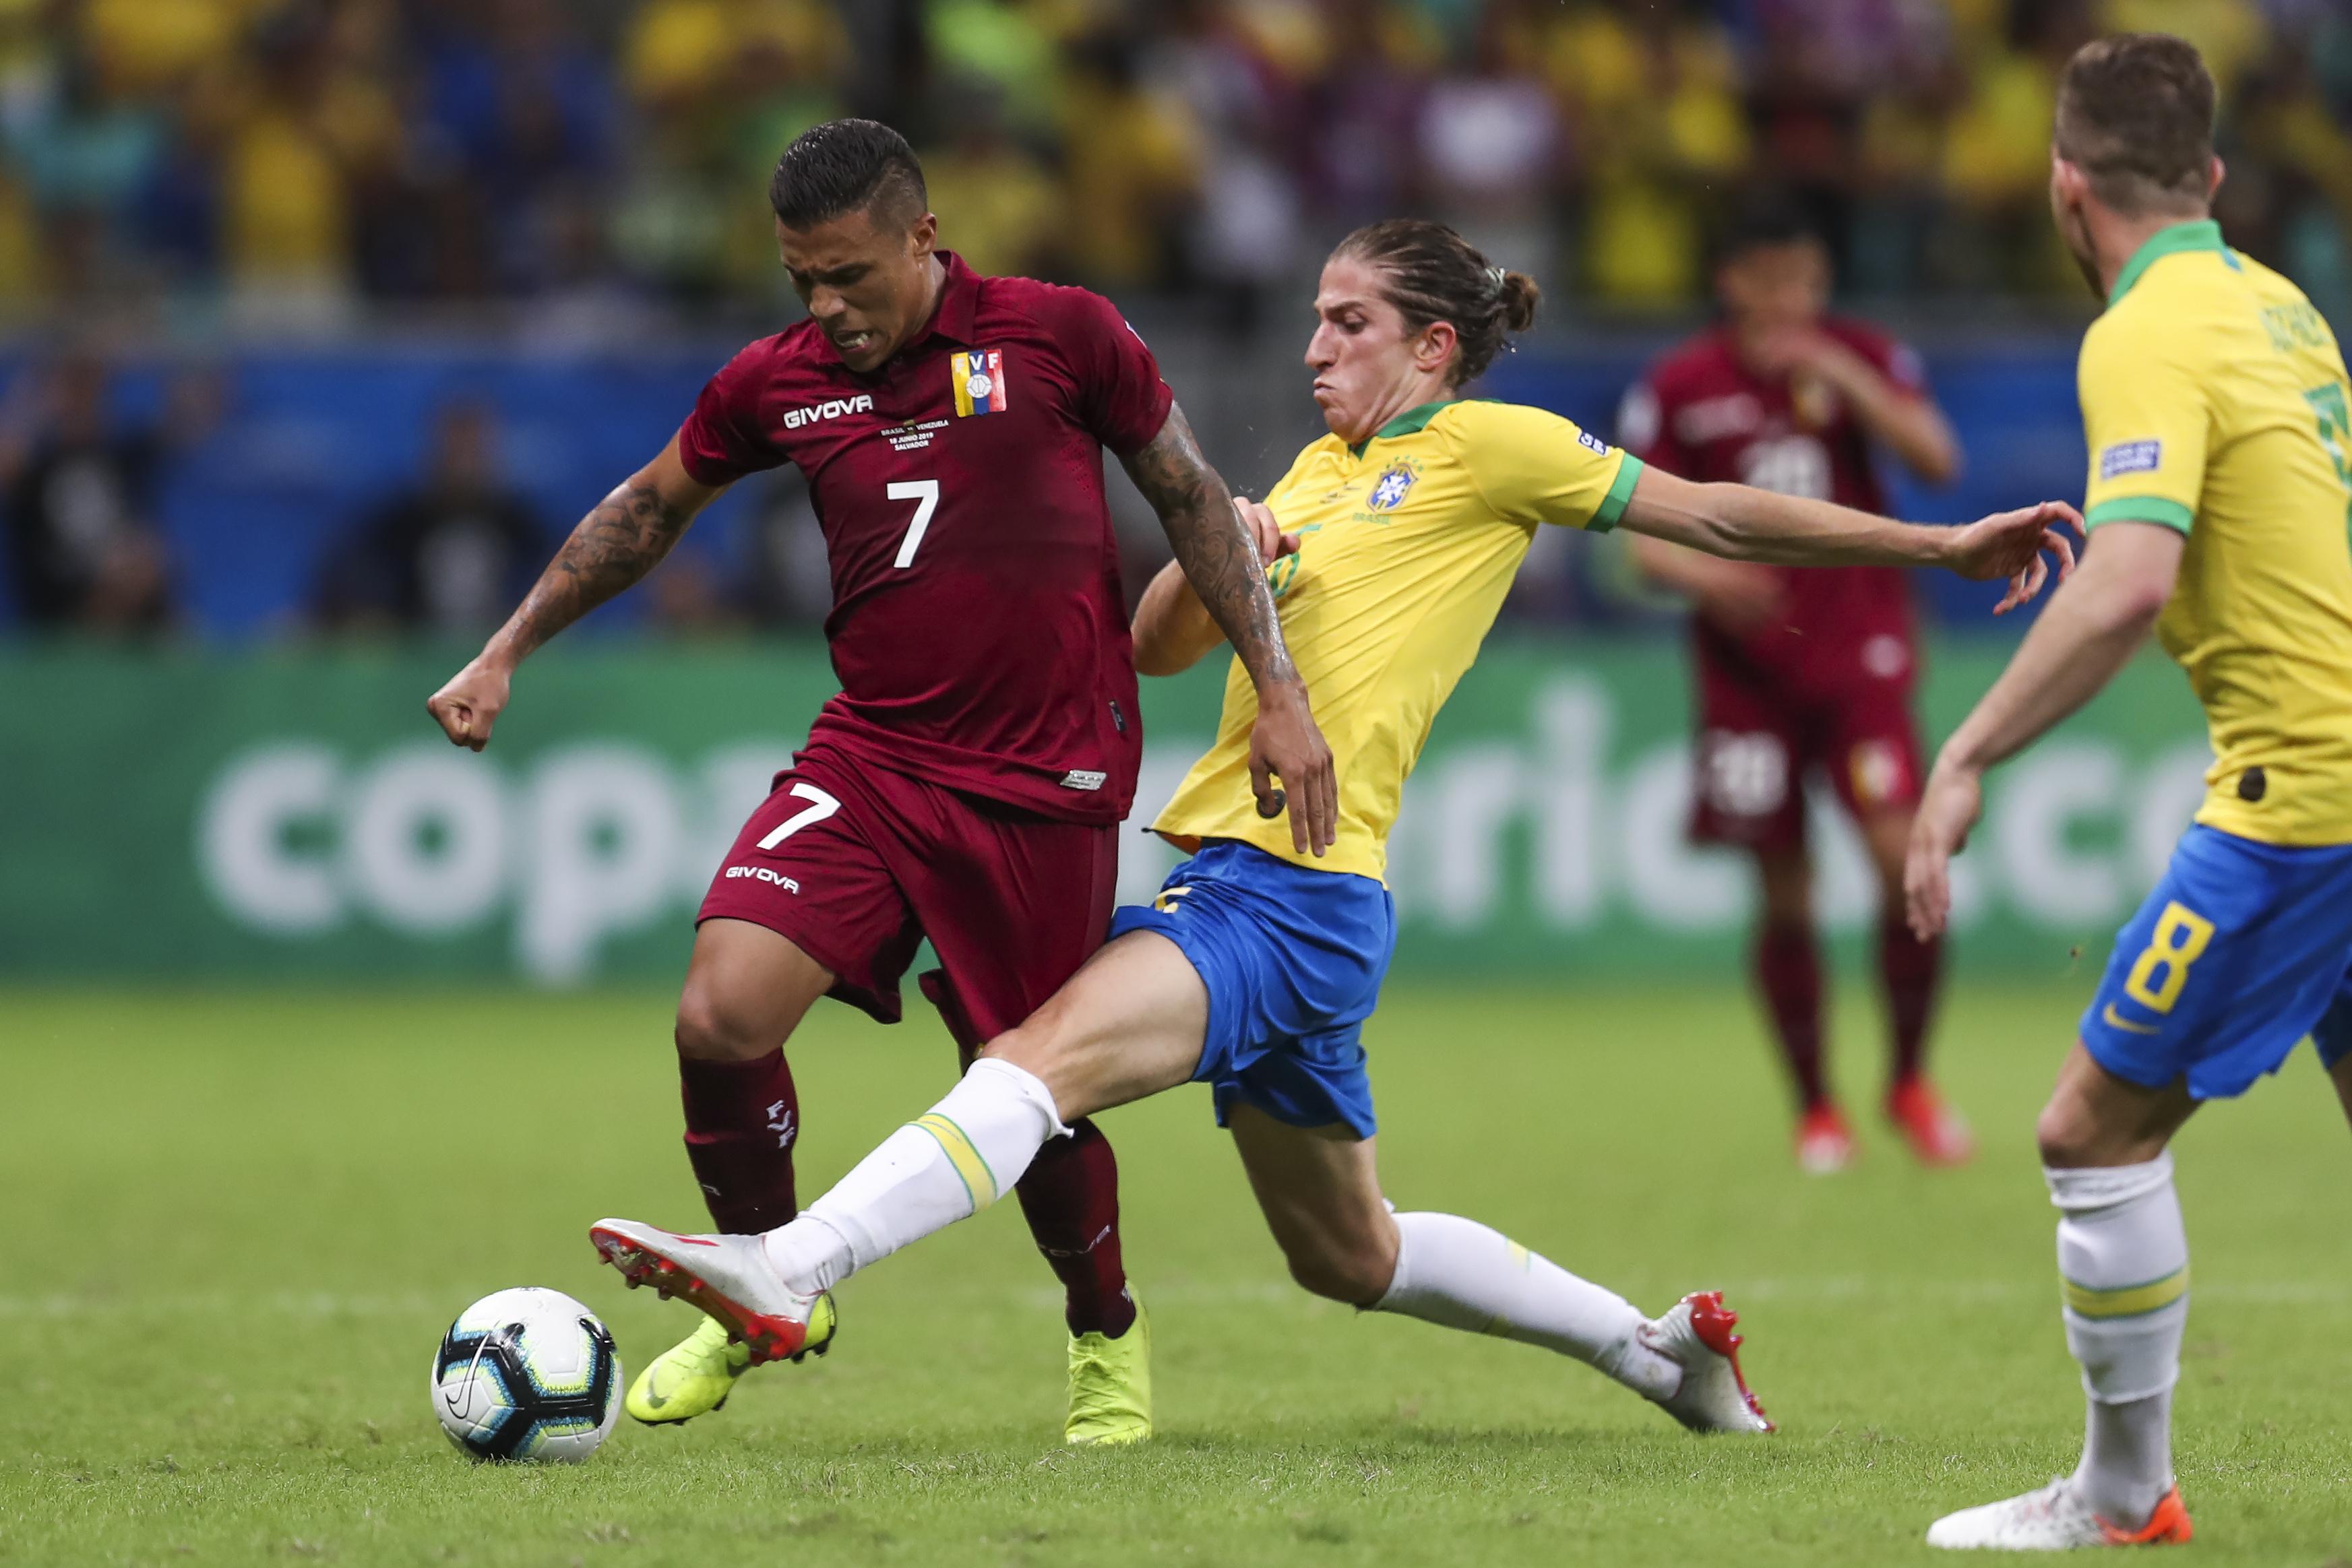 Brazil's Filipe Luis misses practice because of injury